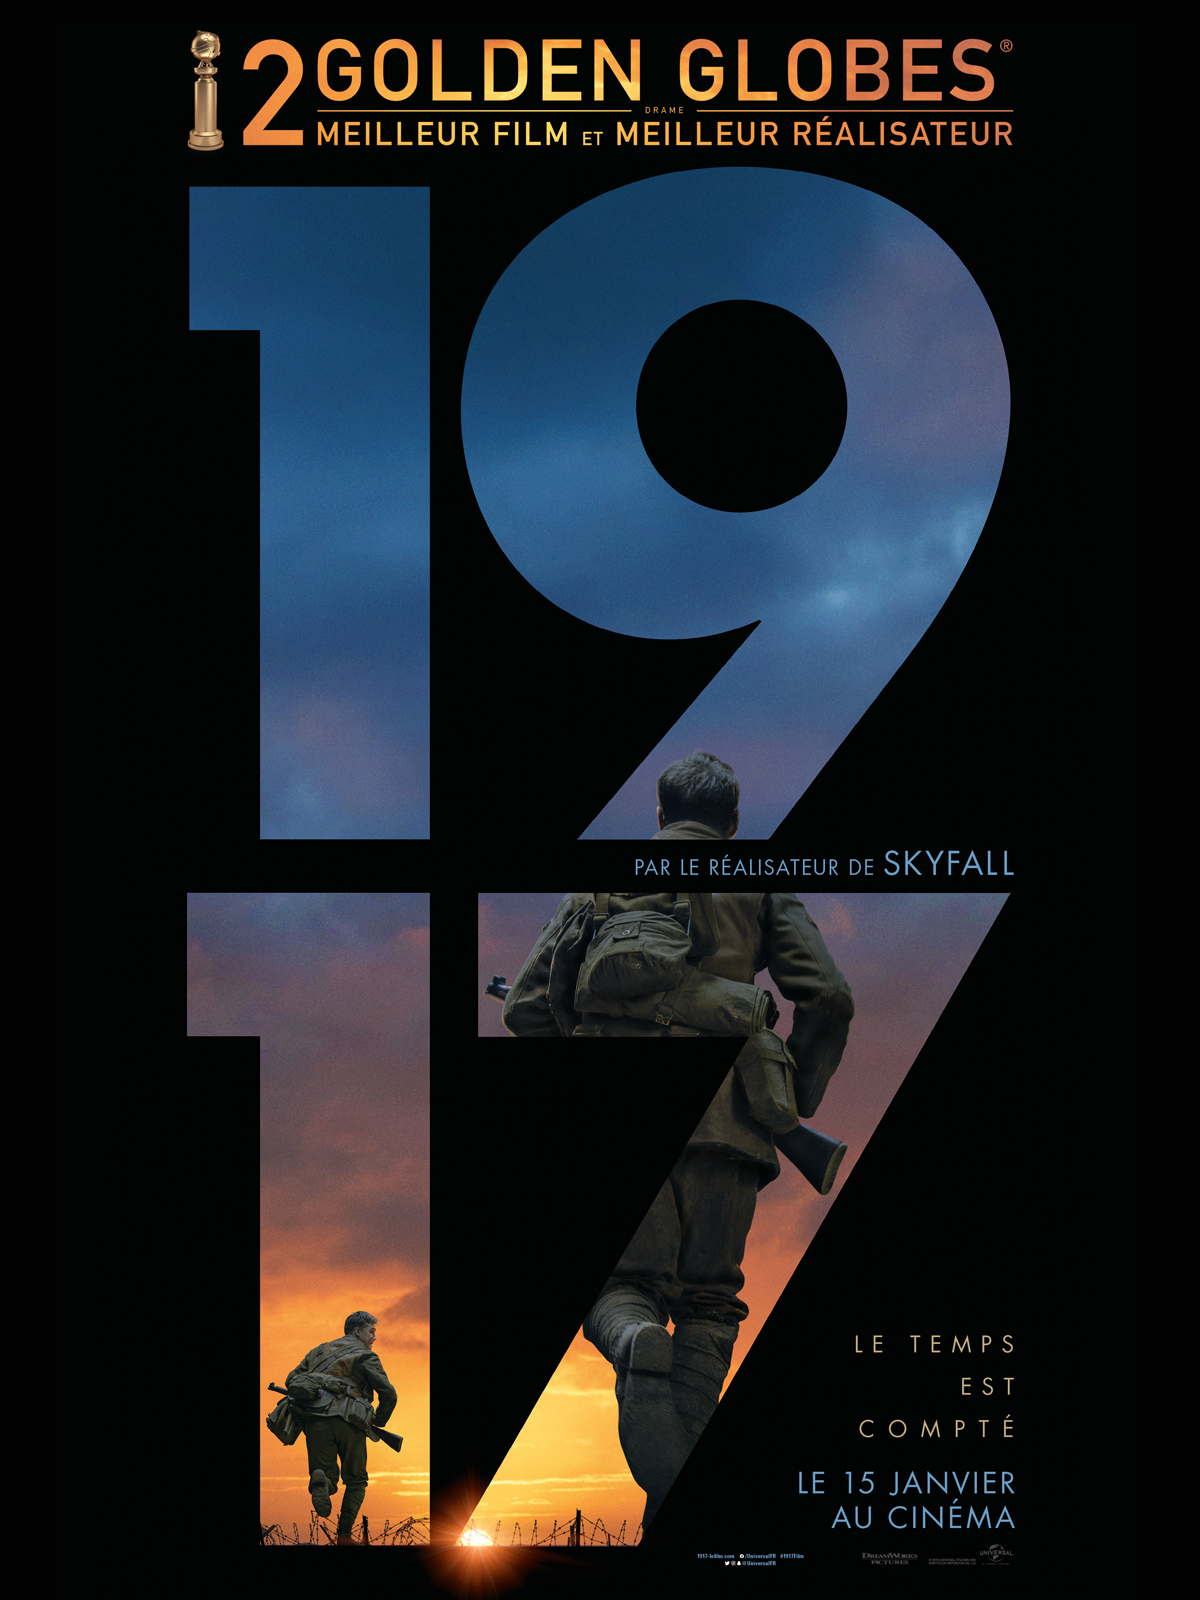 Achat 1917 en Blu Ray - AlloCiné